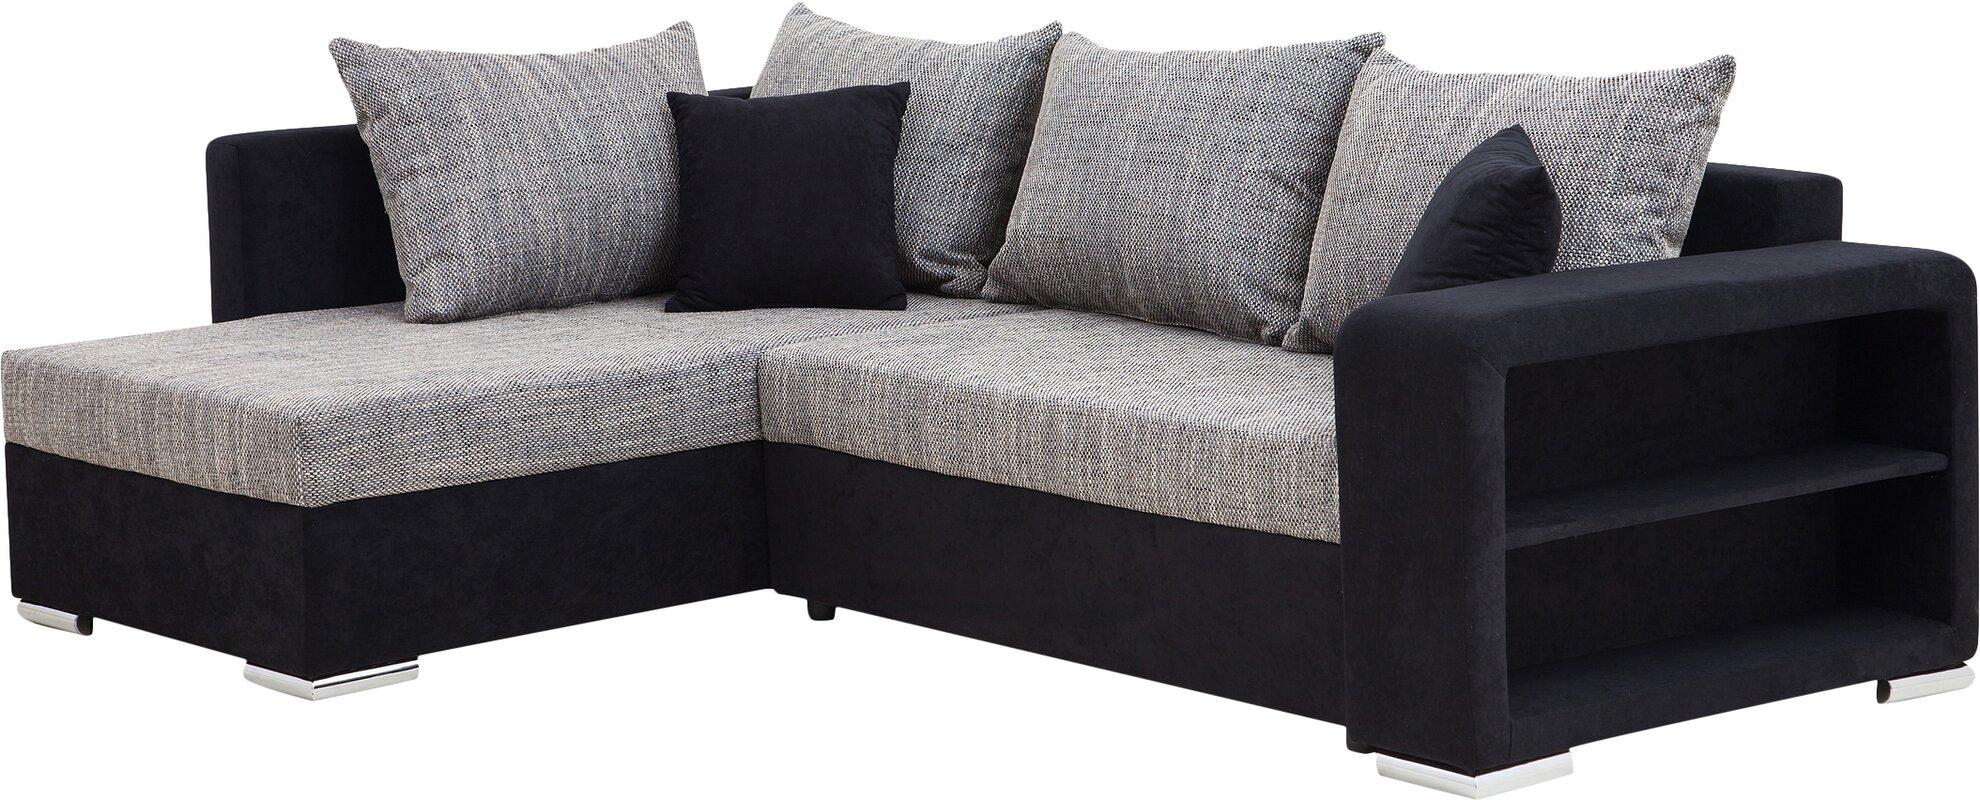 home haus ecksofa balgalal mit bettfunktion bewertungen. Black Bedroom Furniture Sets. Home Design Ideas